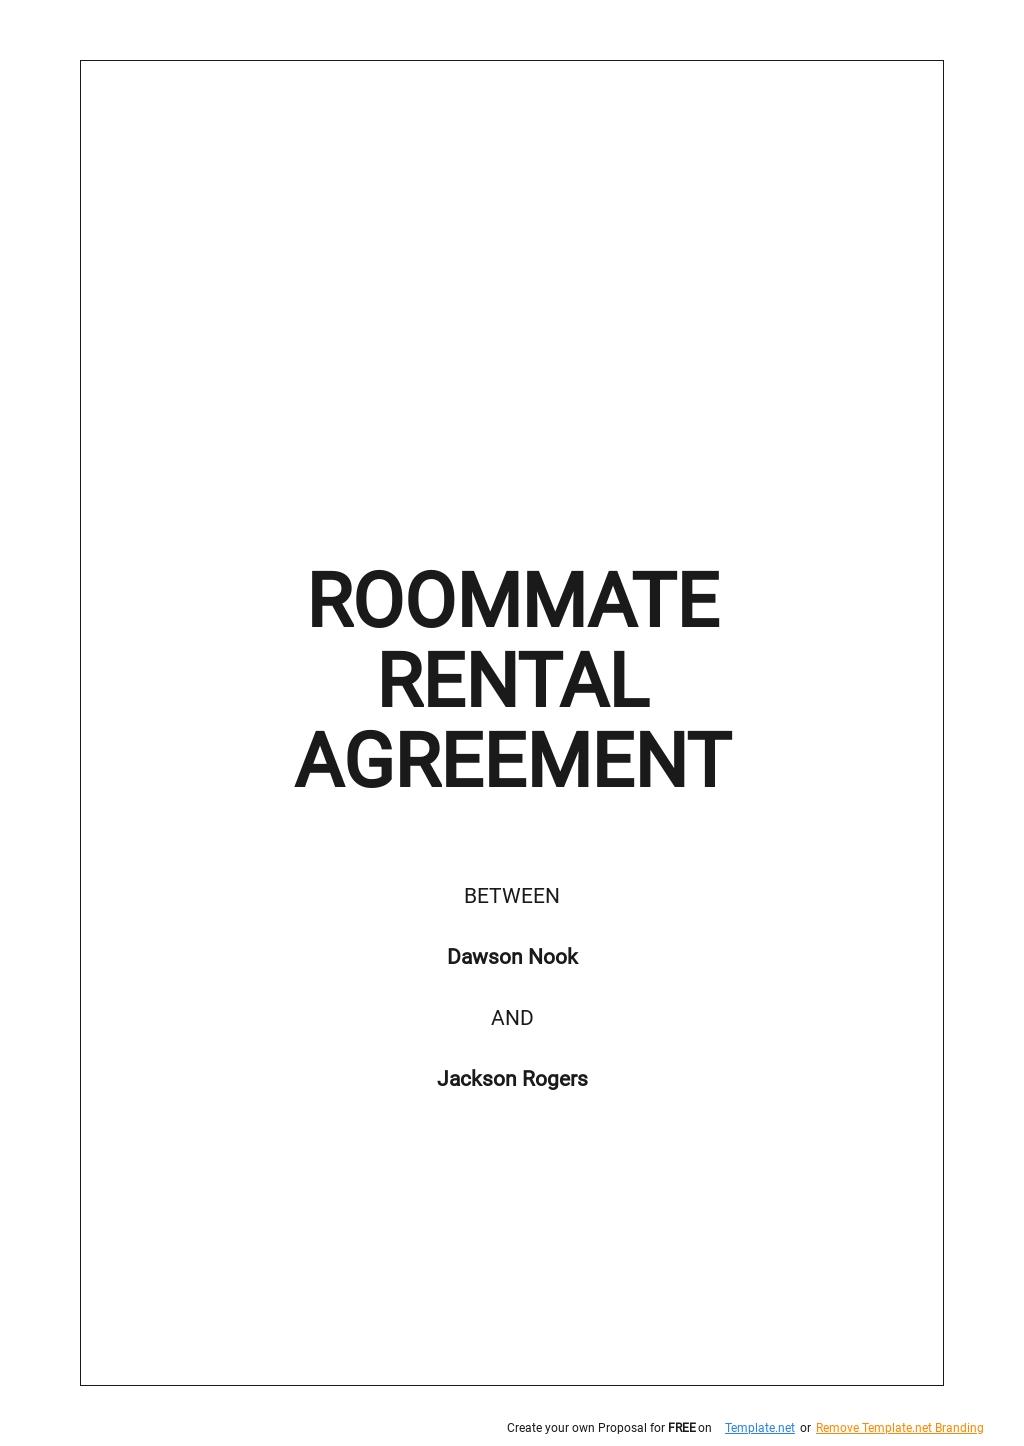 Roommate Rental Agreement Form Template.jpe